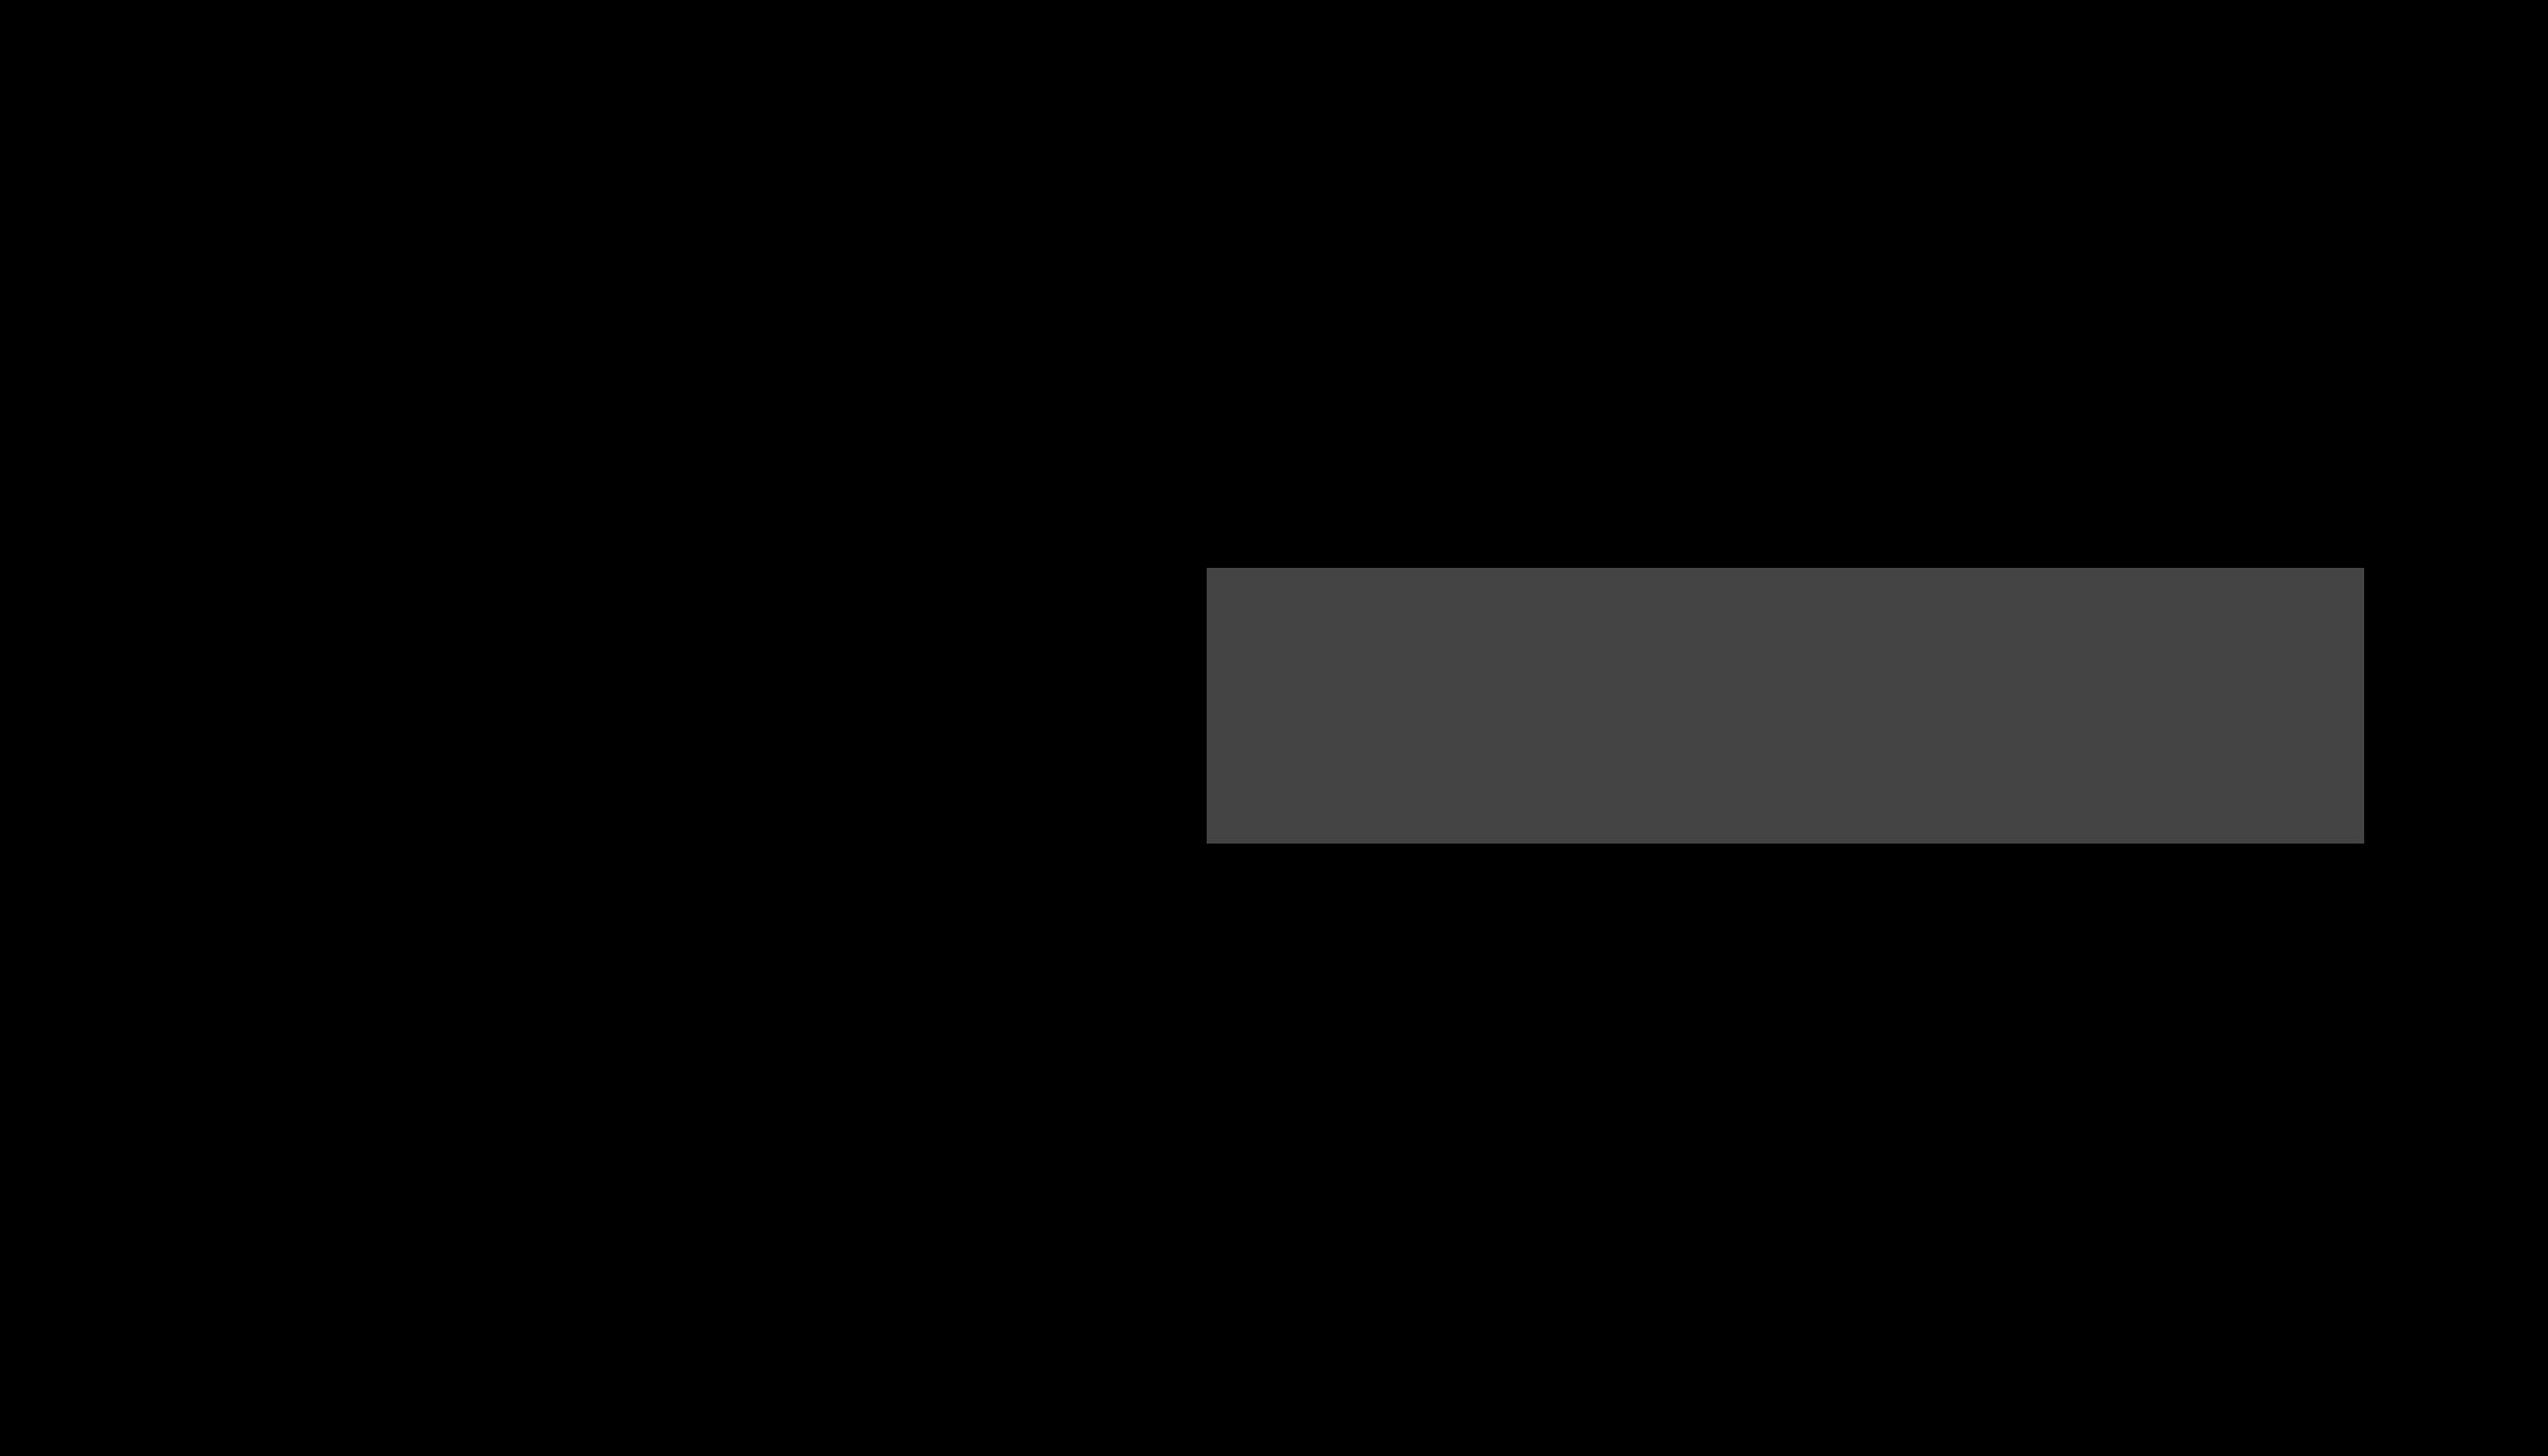 2020 SPRING MEDICATED MAKEUP